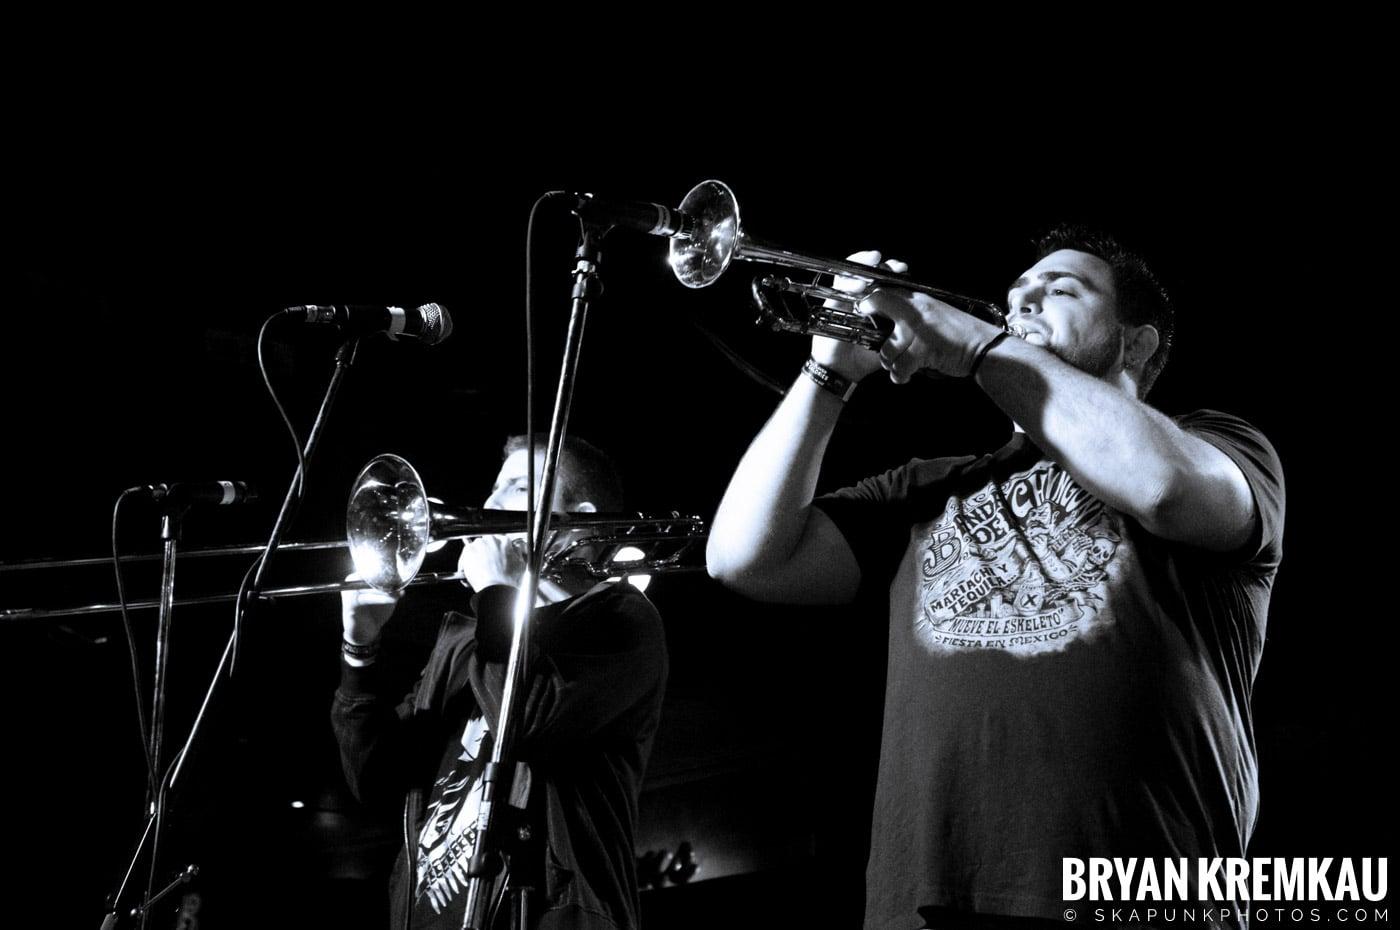 Avon Junkies (Ska is Dead Tour) @ Starland Ballroom, Sayreville, NJ - 11.15.09 (10)